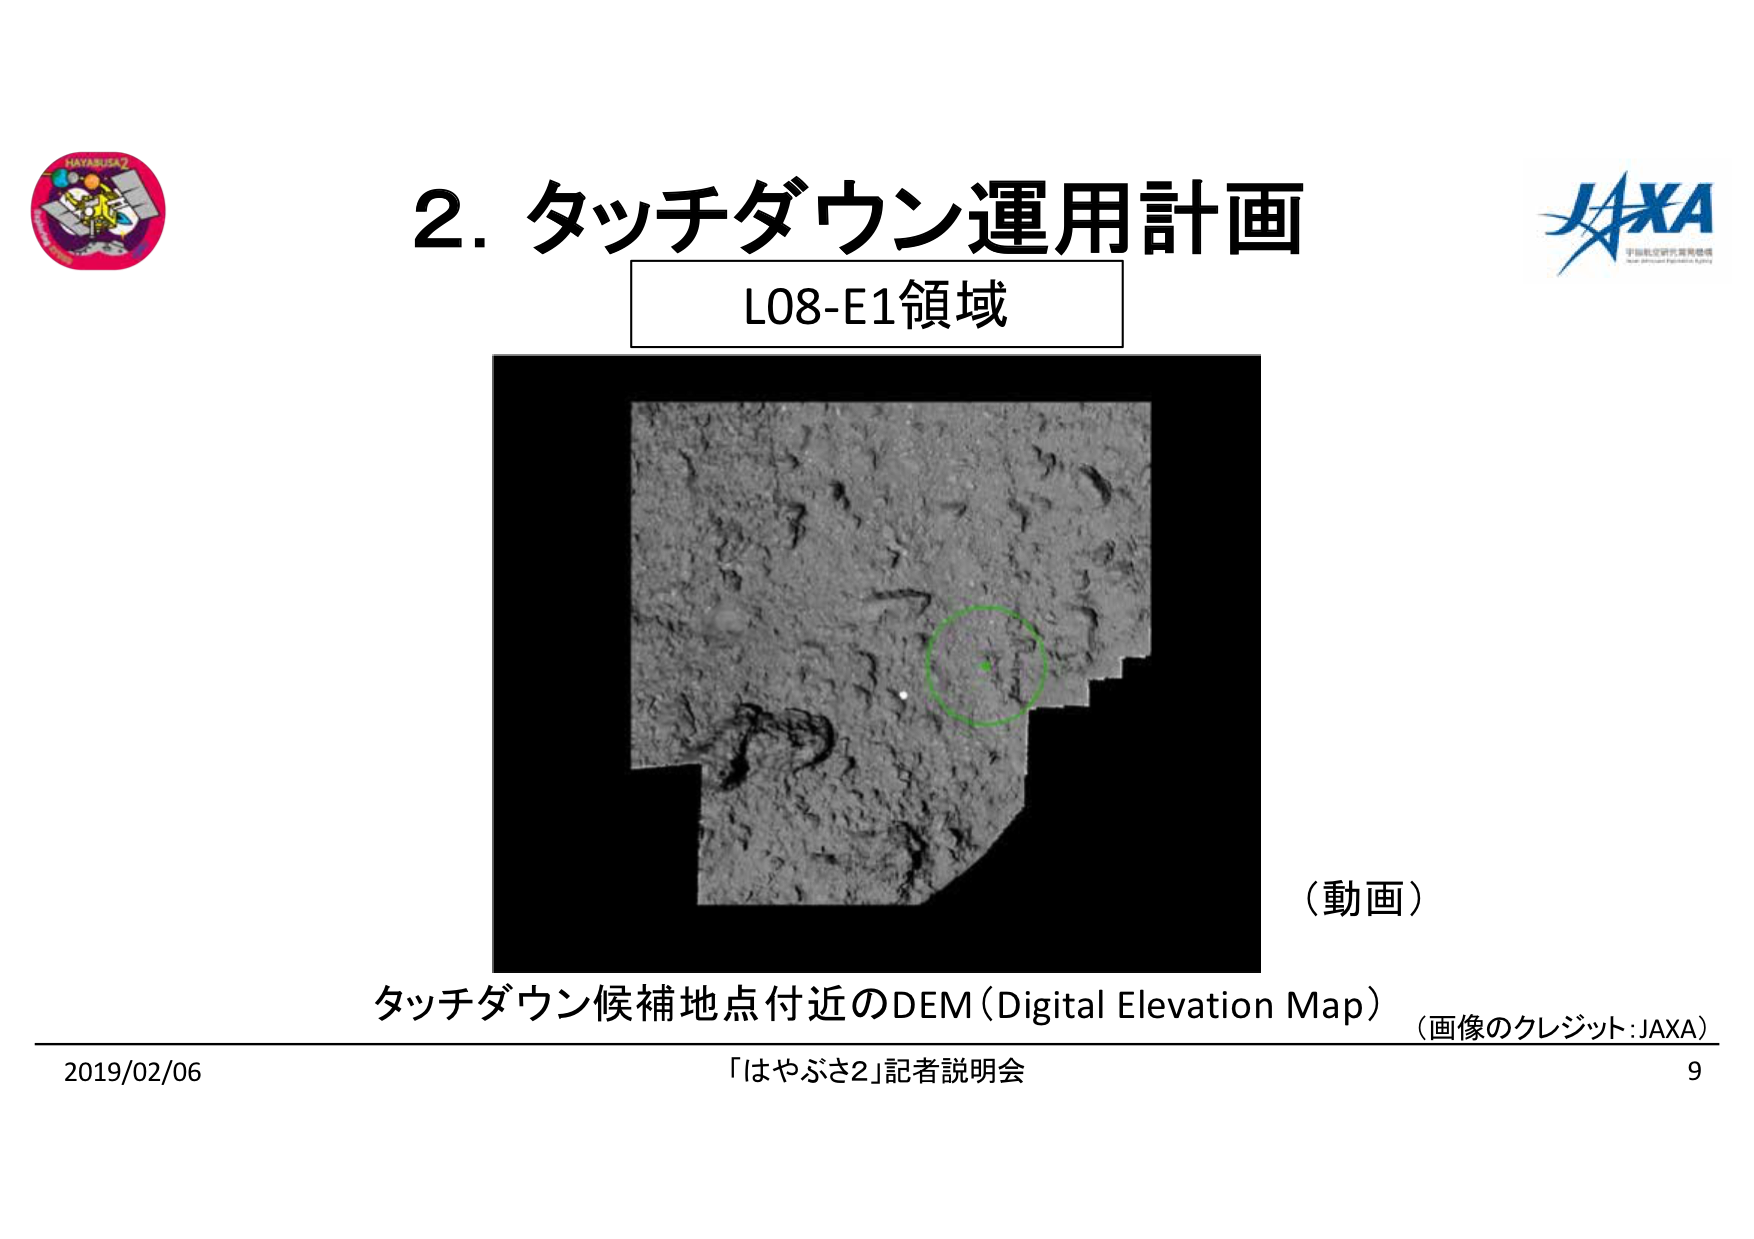 f:id:Imamura:20190204175503p:plain